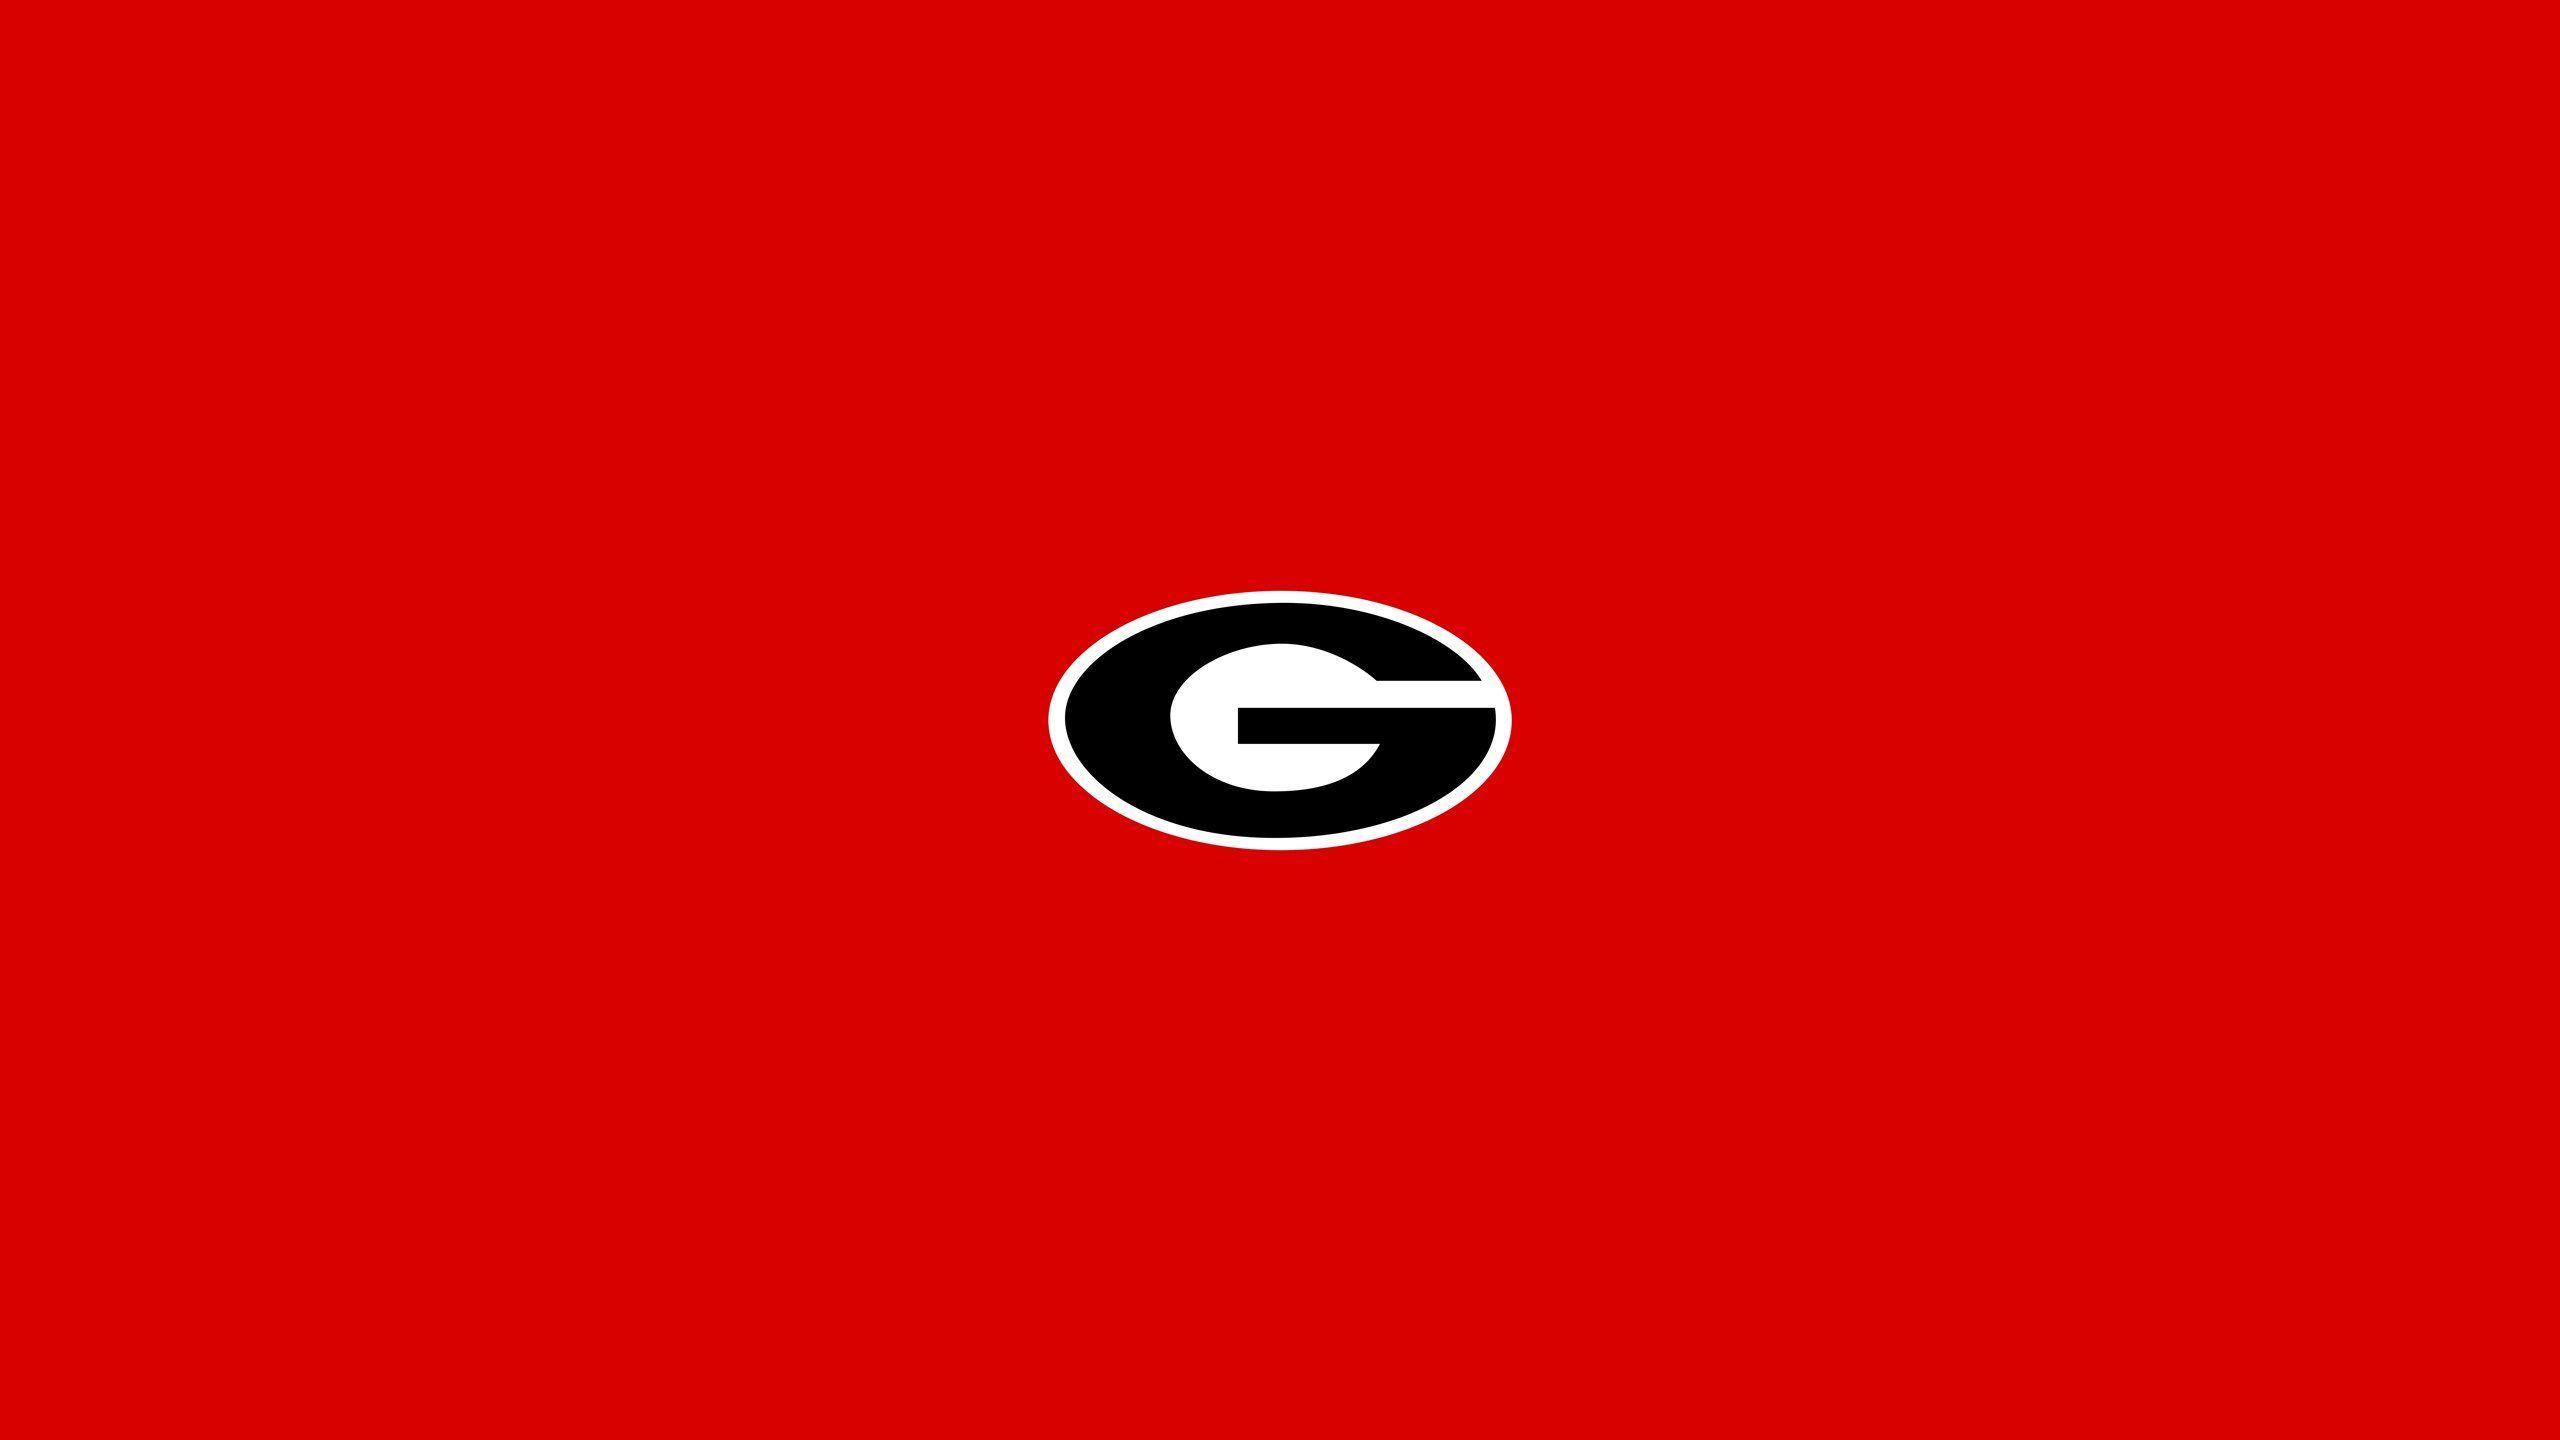 Georgia Bulldogs Wallpapers Free wallpaper hd | wallpapers ...